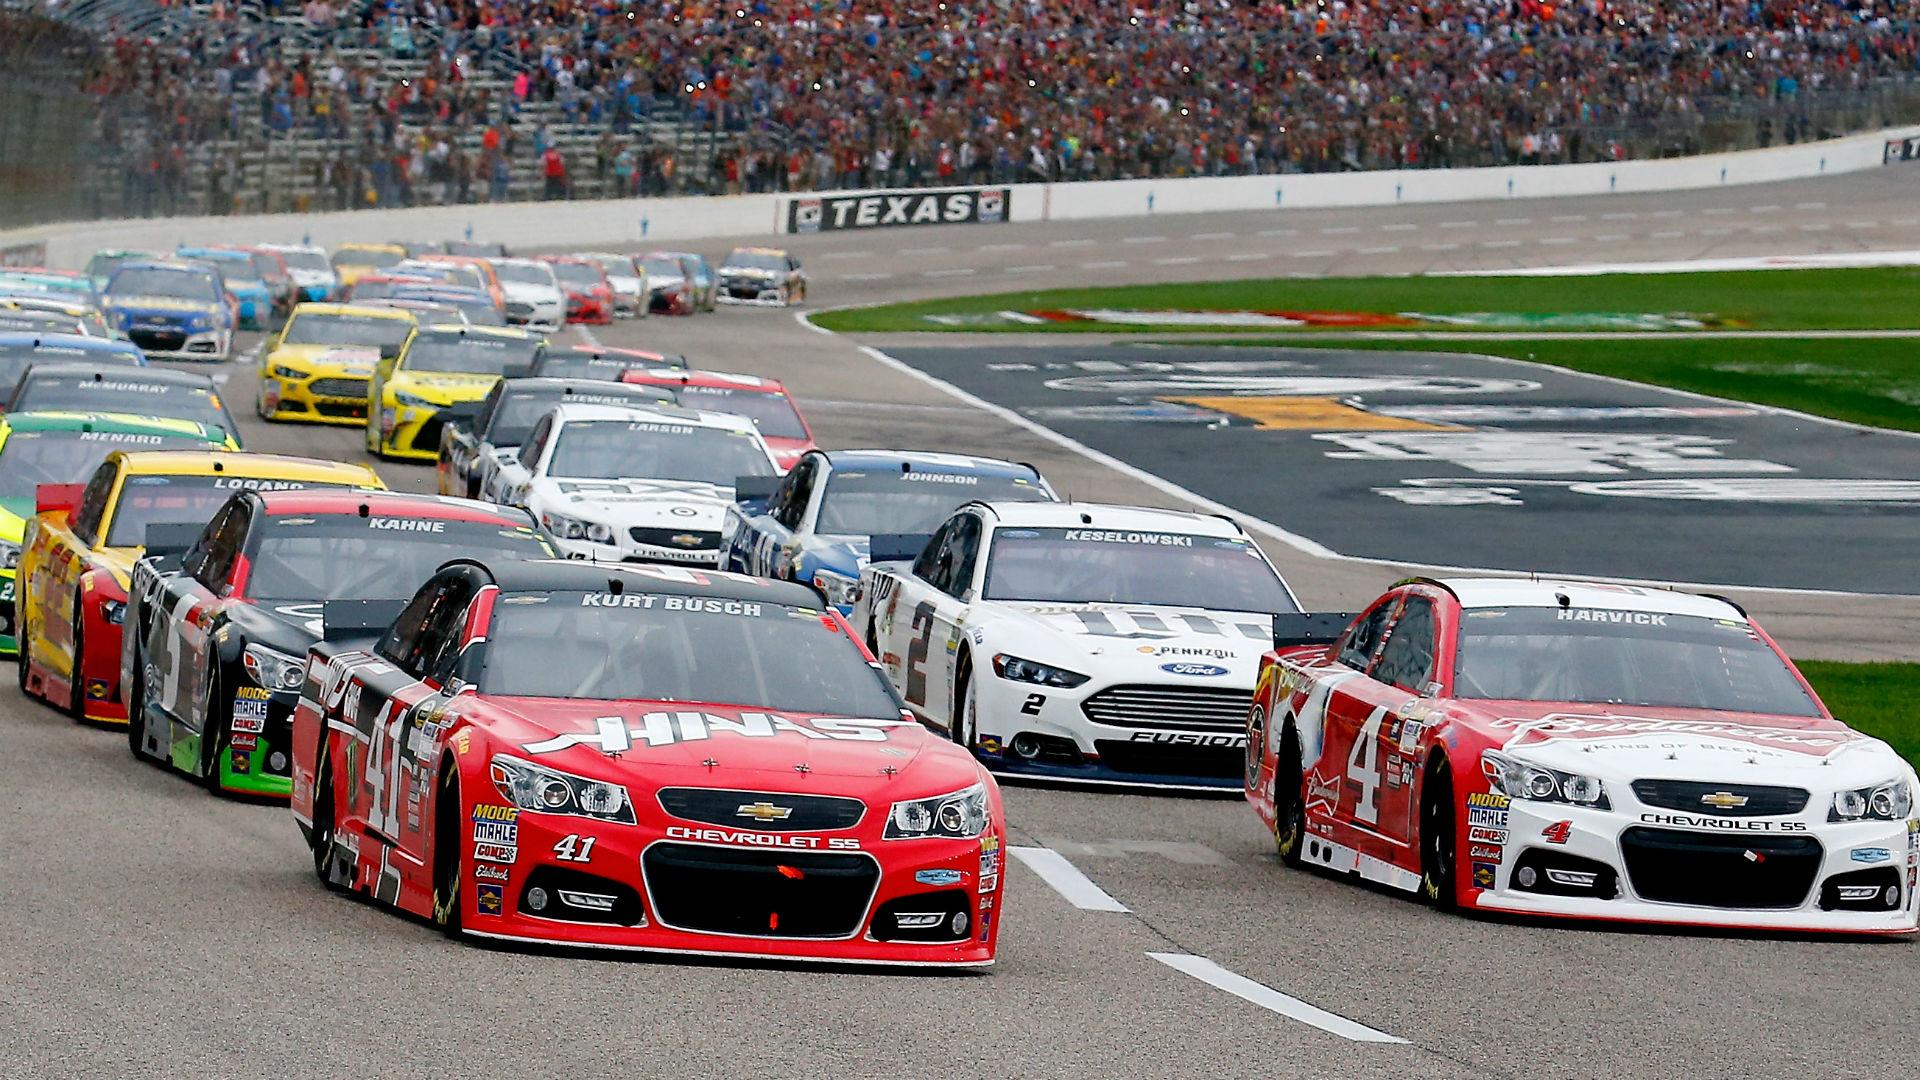 Texas Motor Speedway Lineup